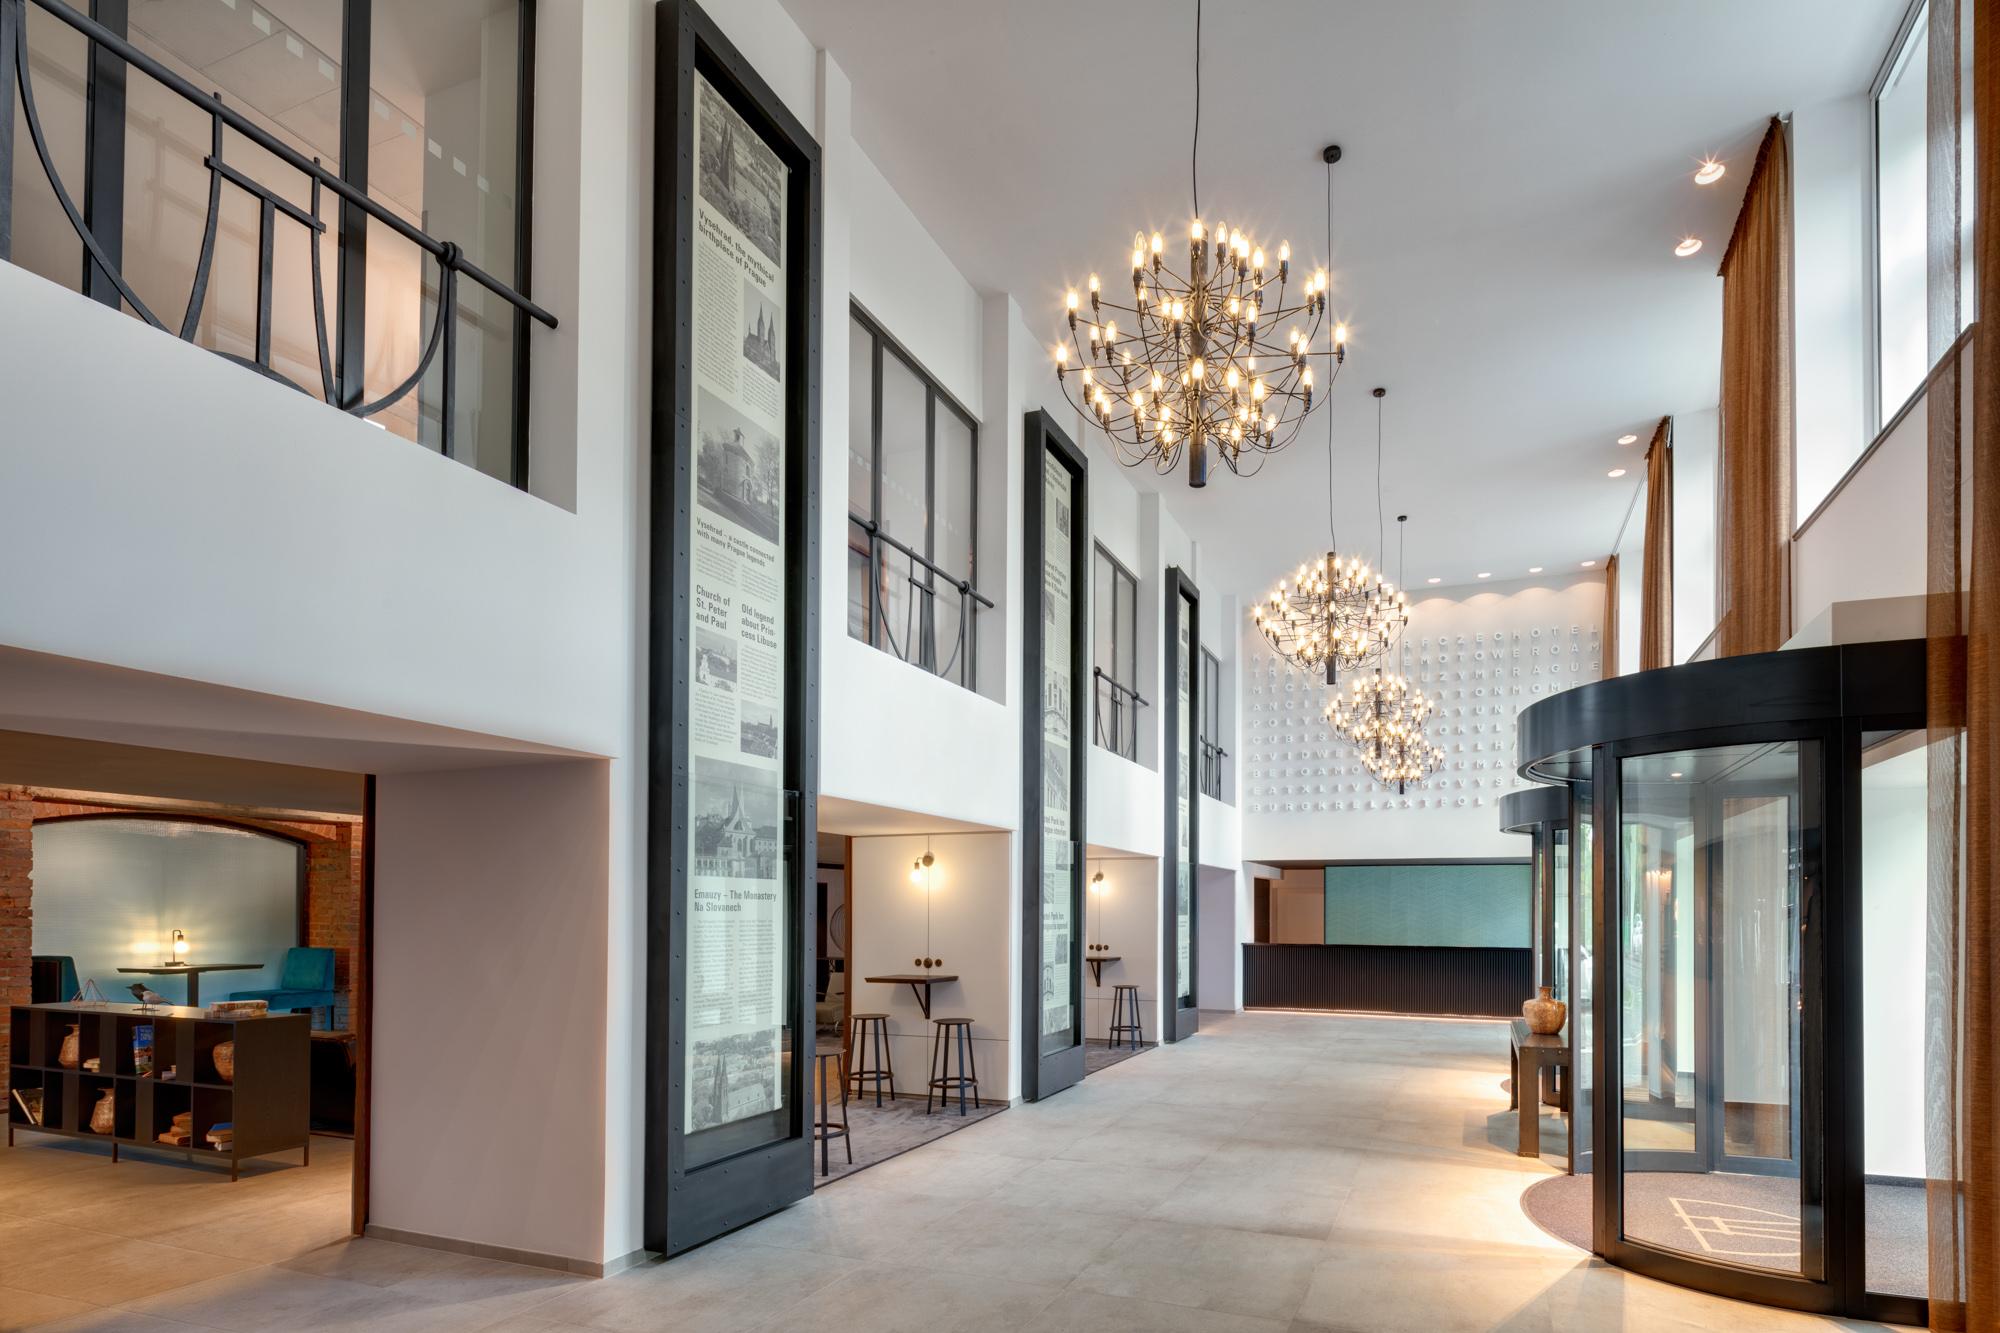 Radisson Hotel Park Inn Prague Interior